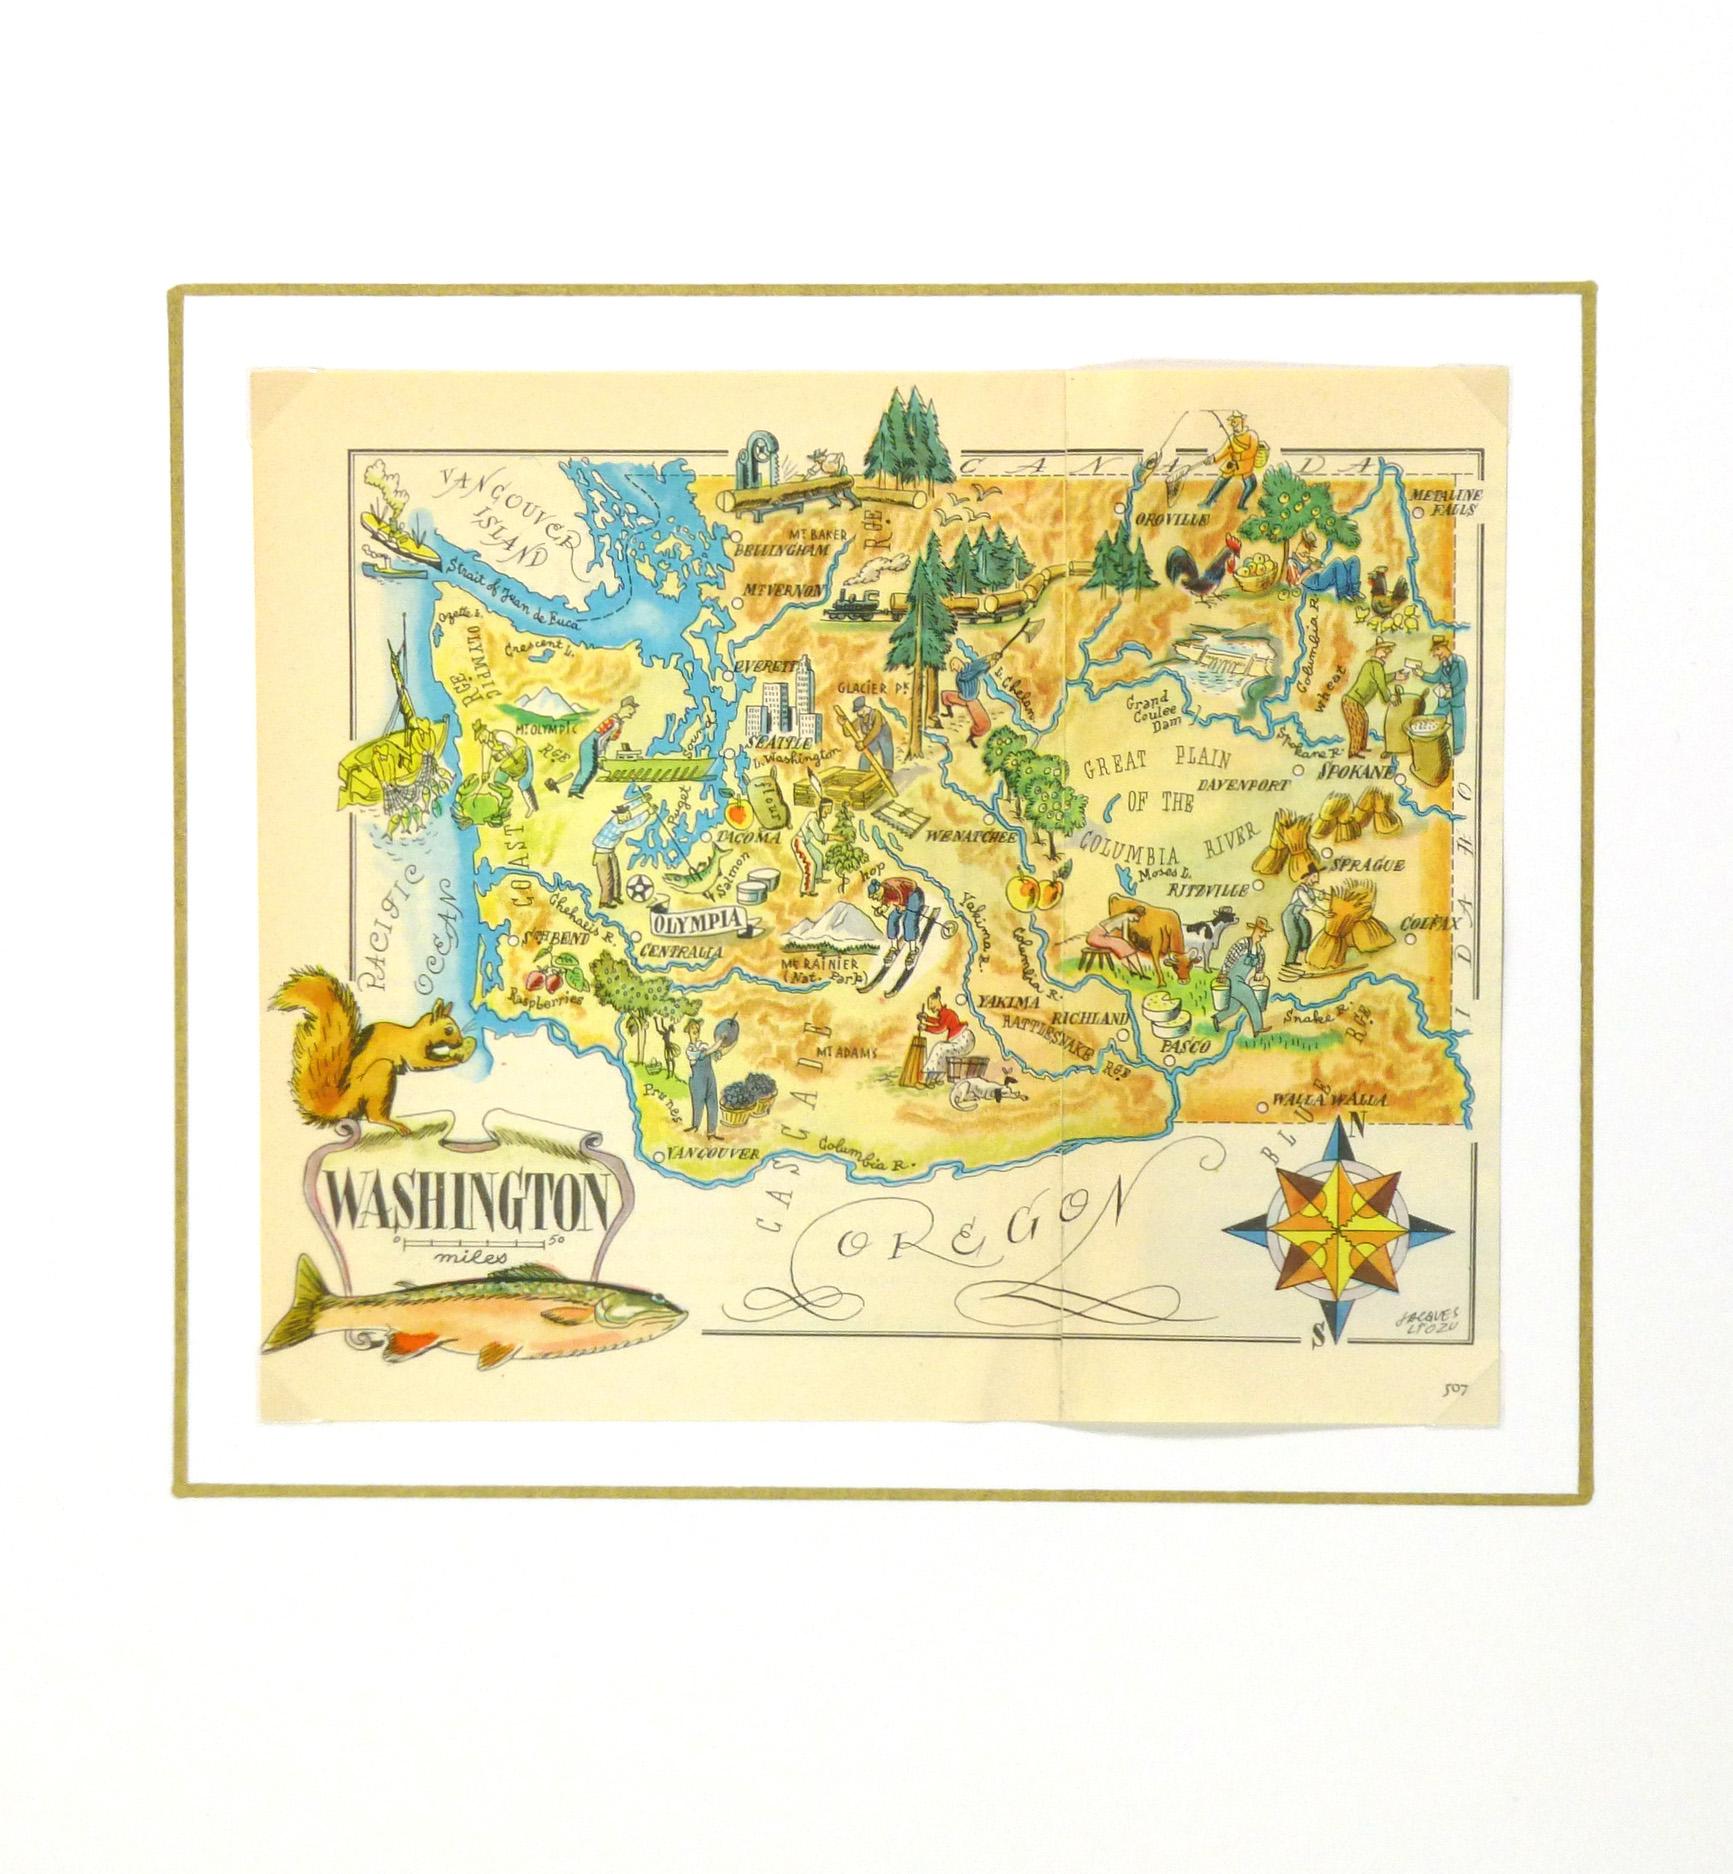 Washington Pictorial Map, 1946-matted-6260K